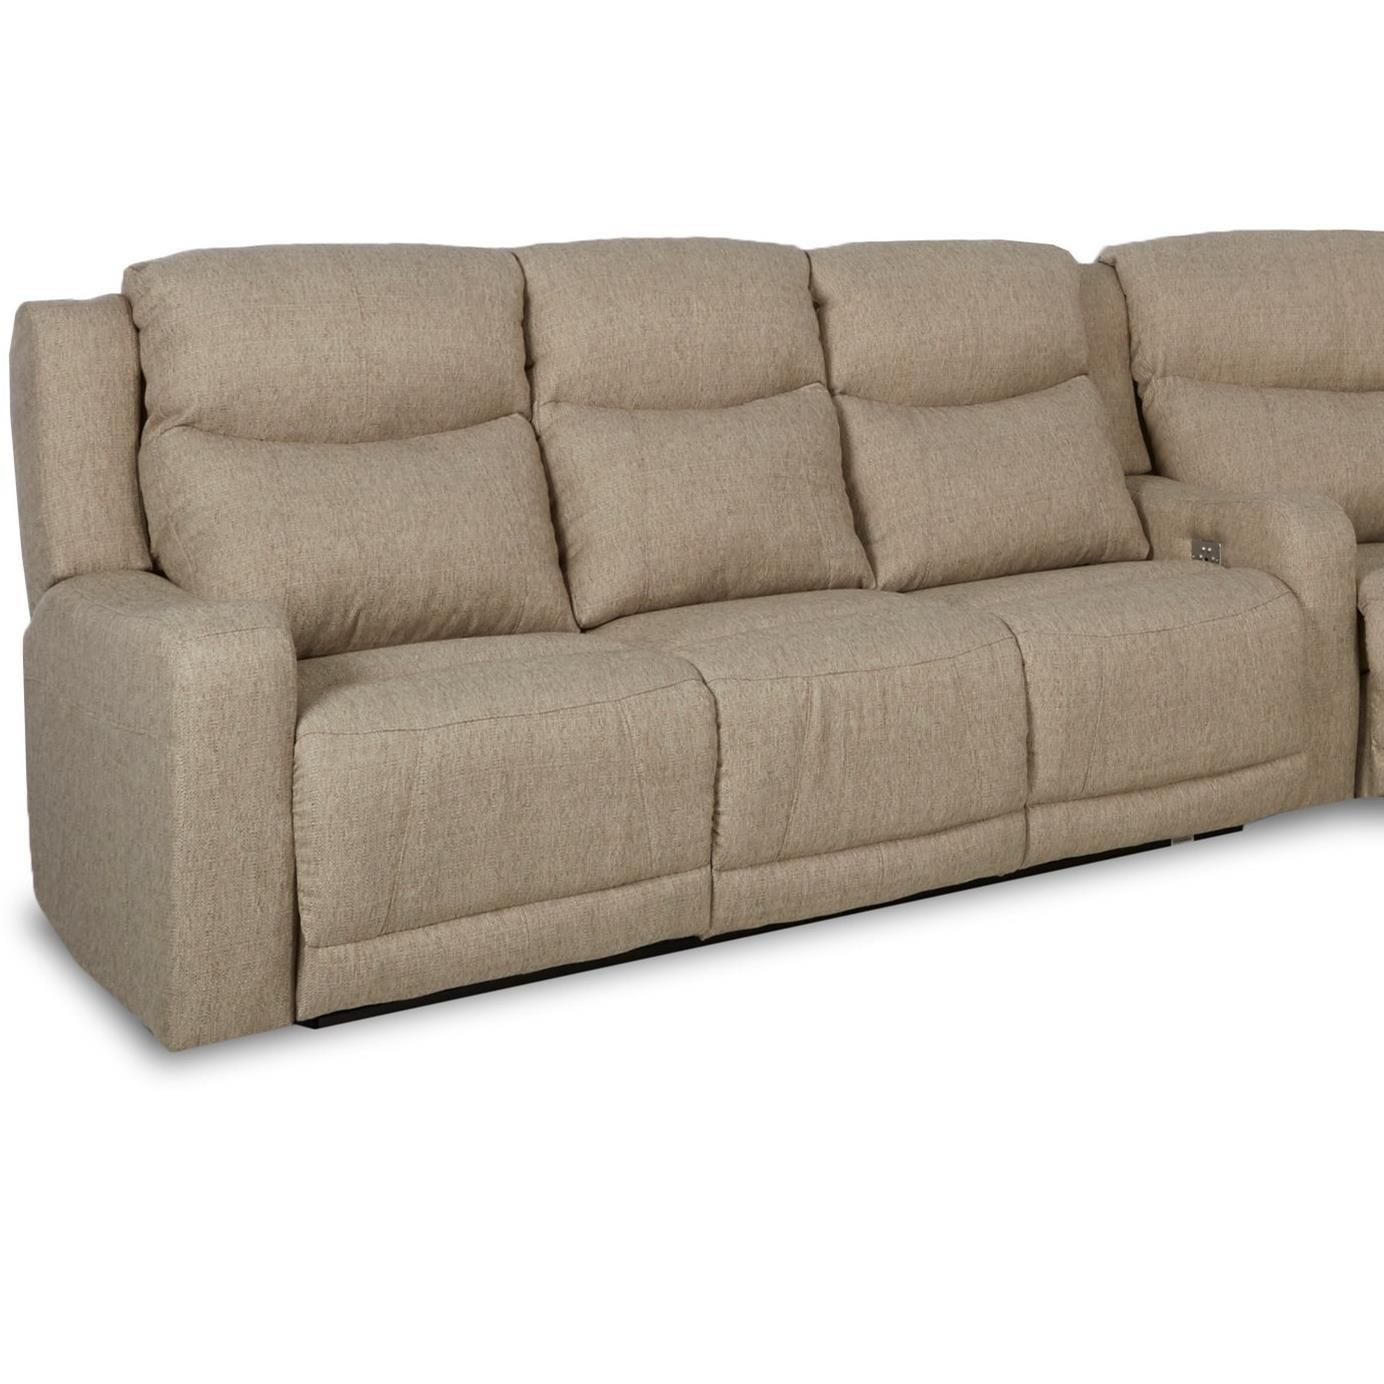 Klaussner Barnett Power Reclining Sofa With Power